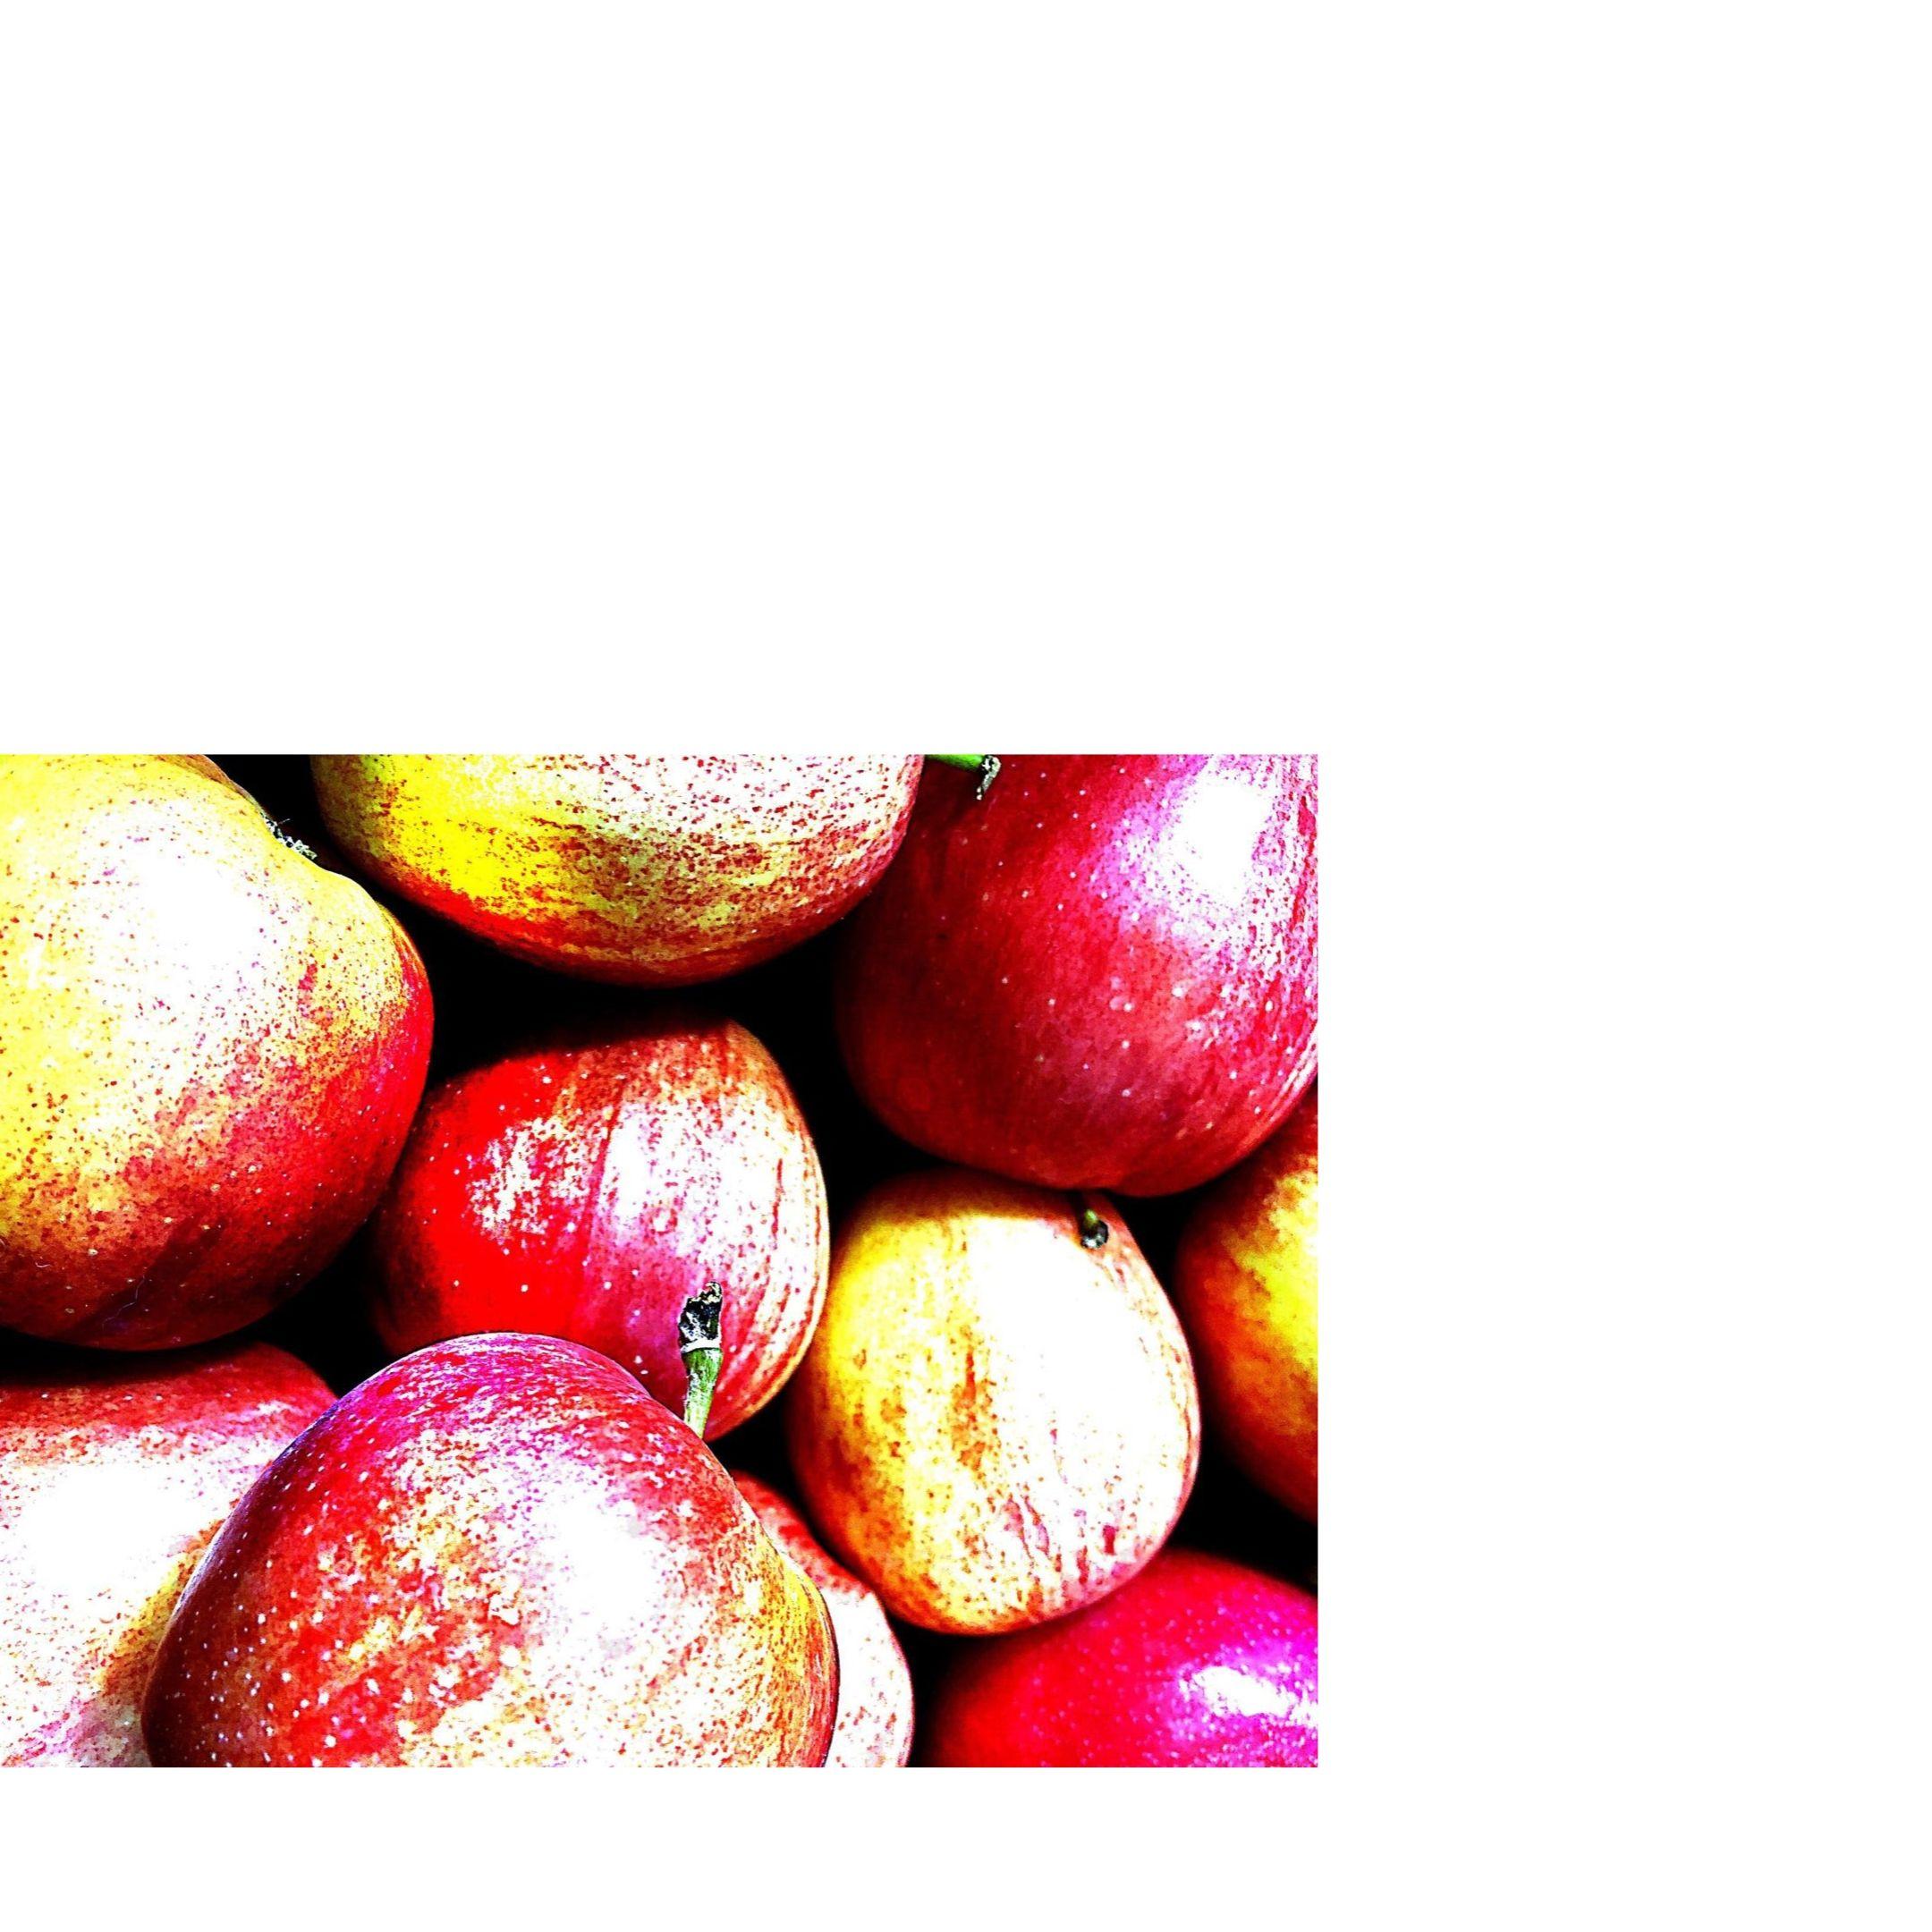 apples, edited